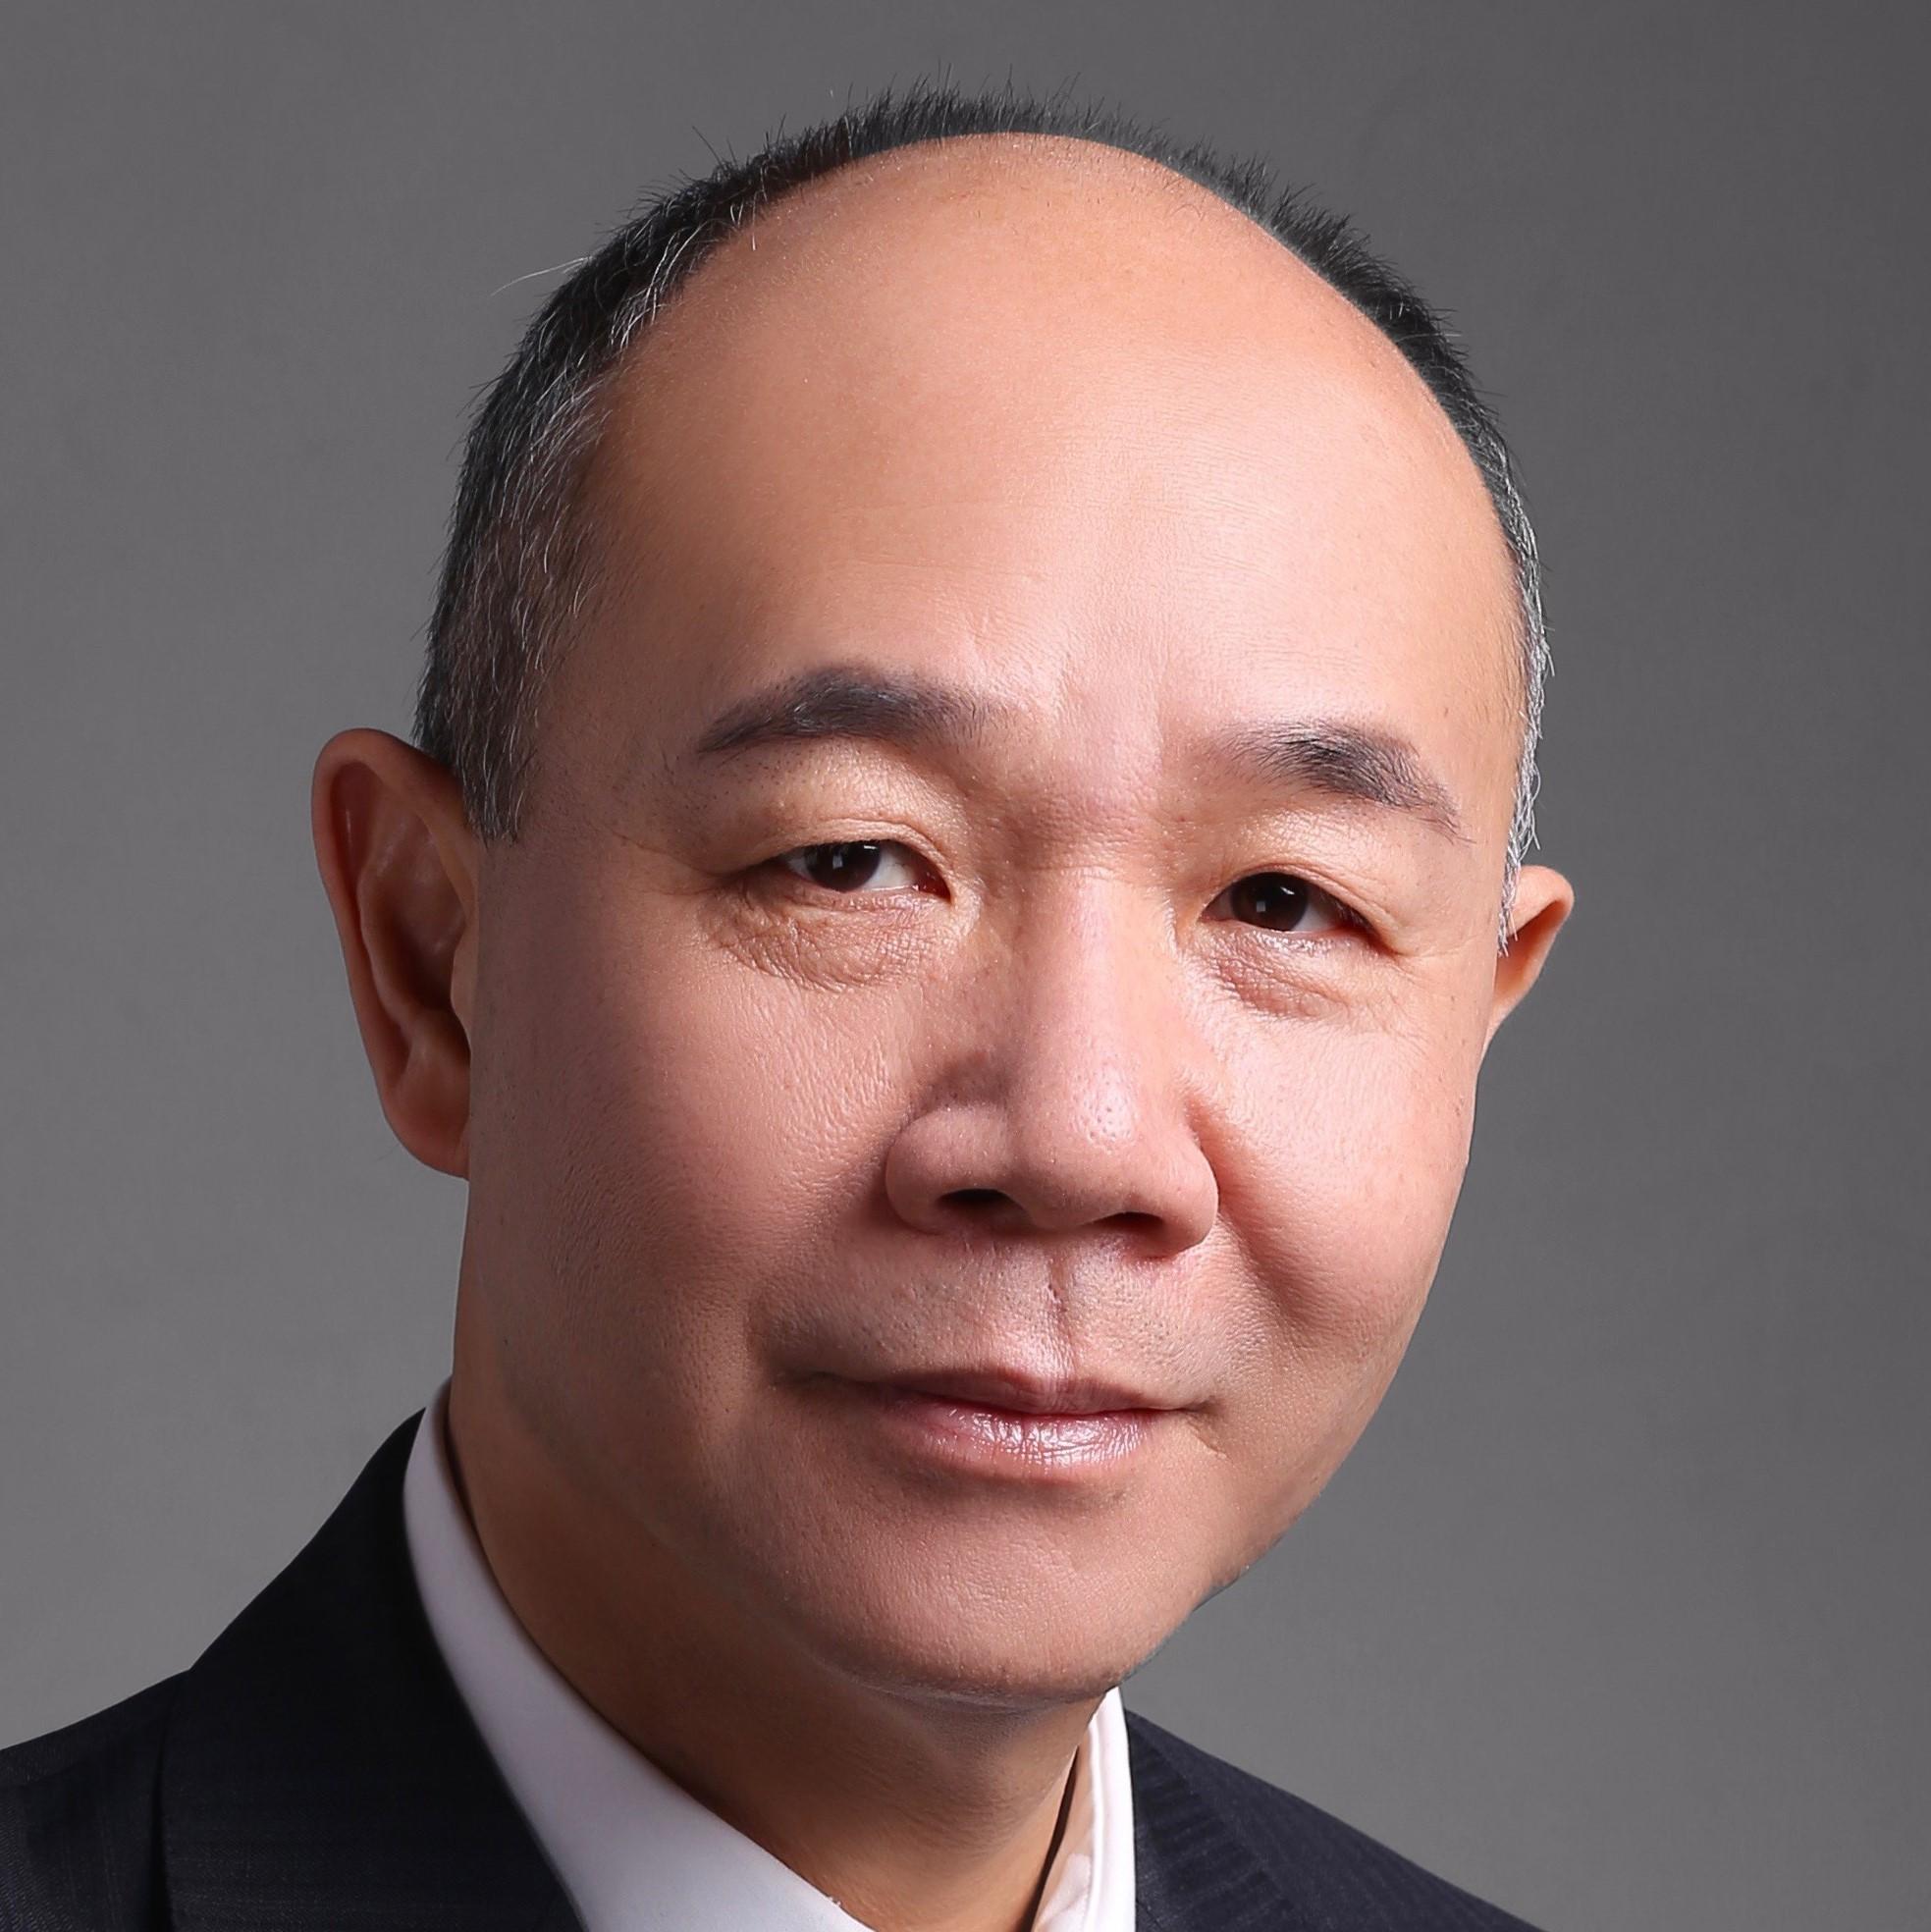 Dr. Jolly Wong